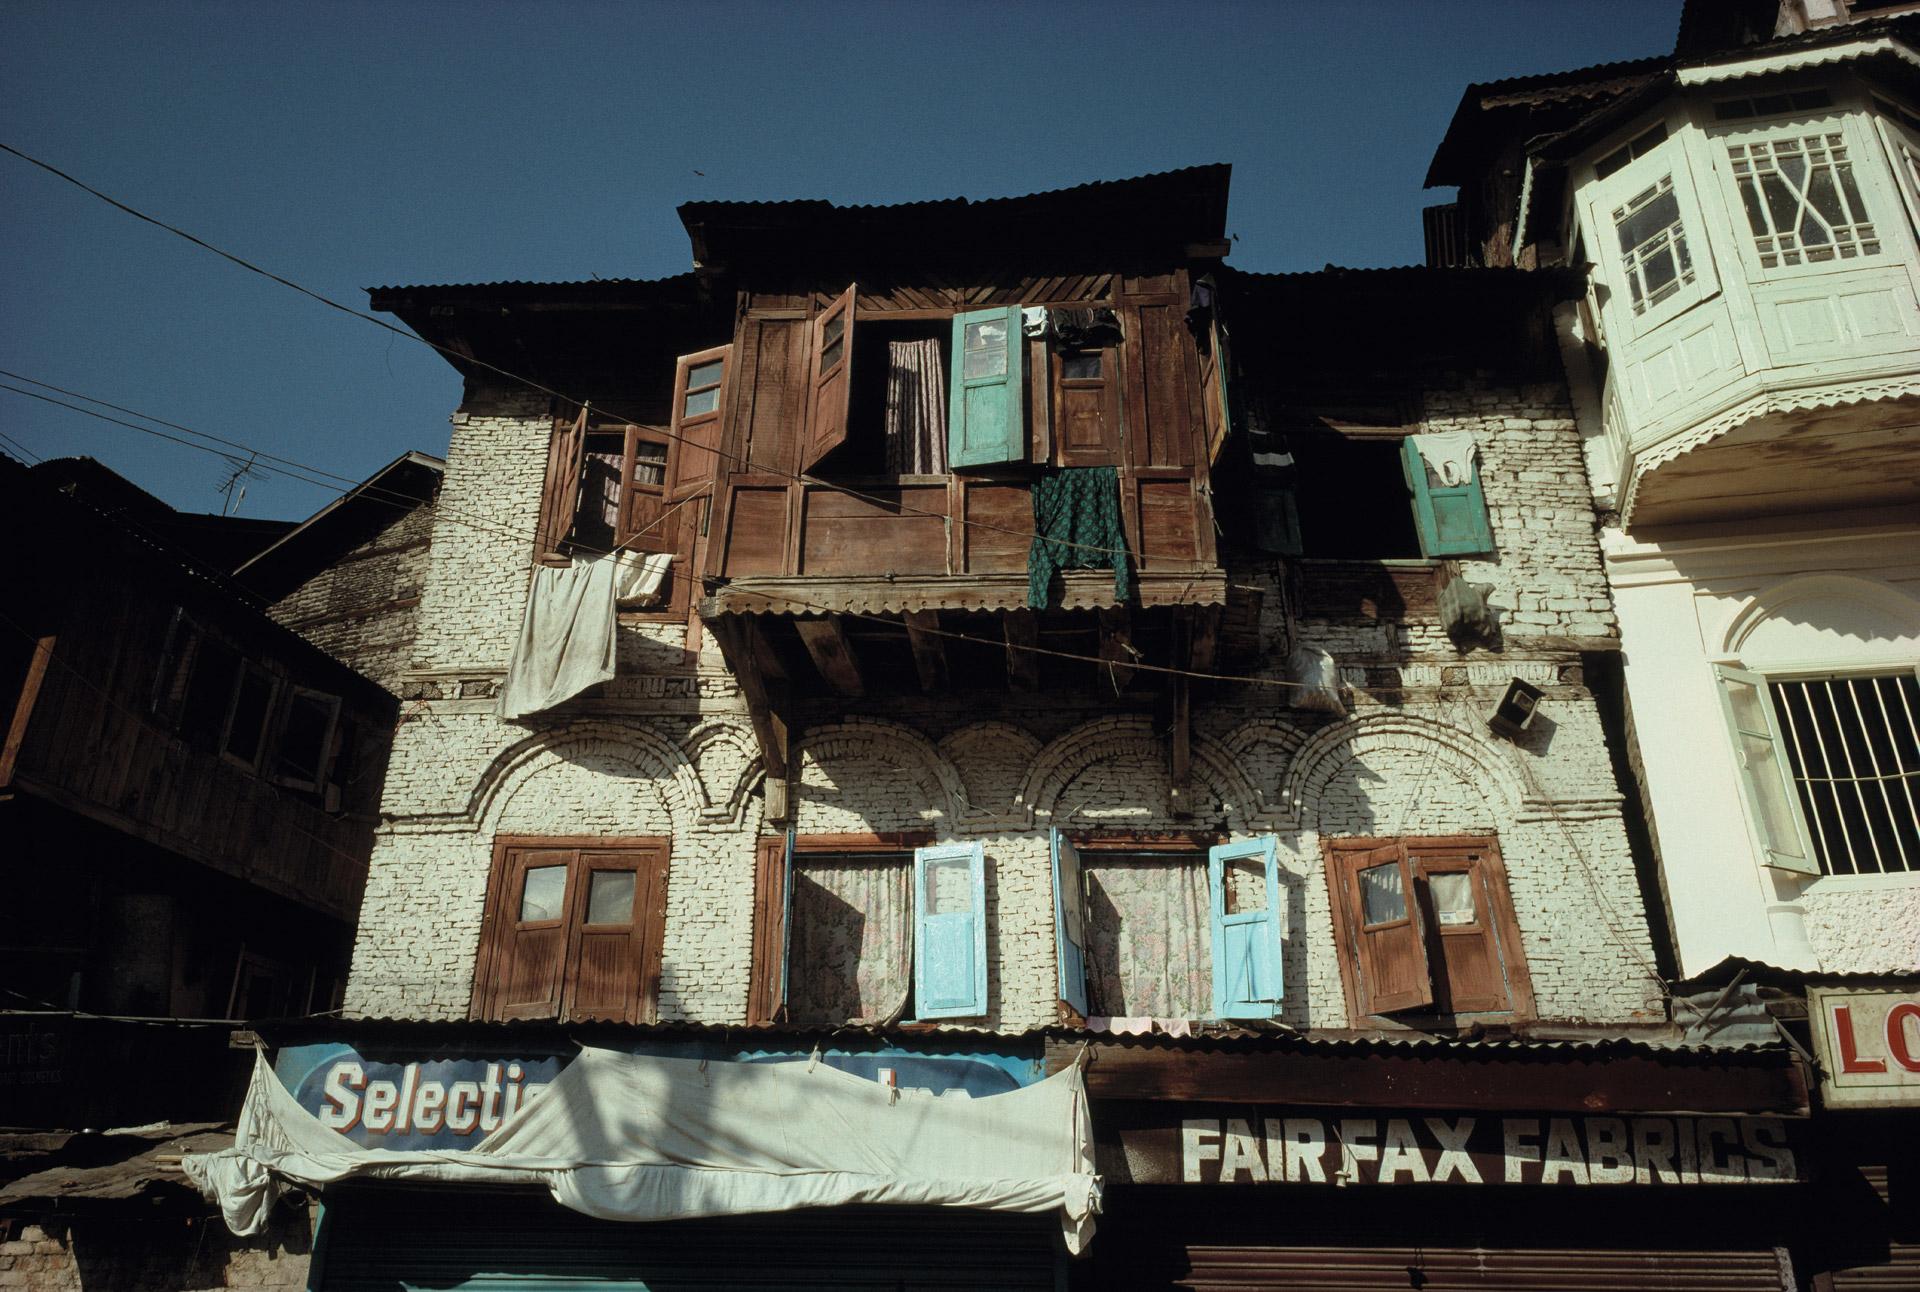 Houses in Shrinagar in Kashmir in India